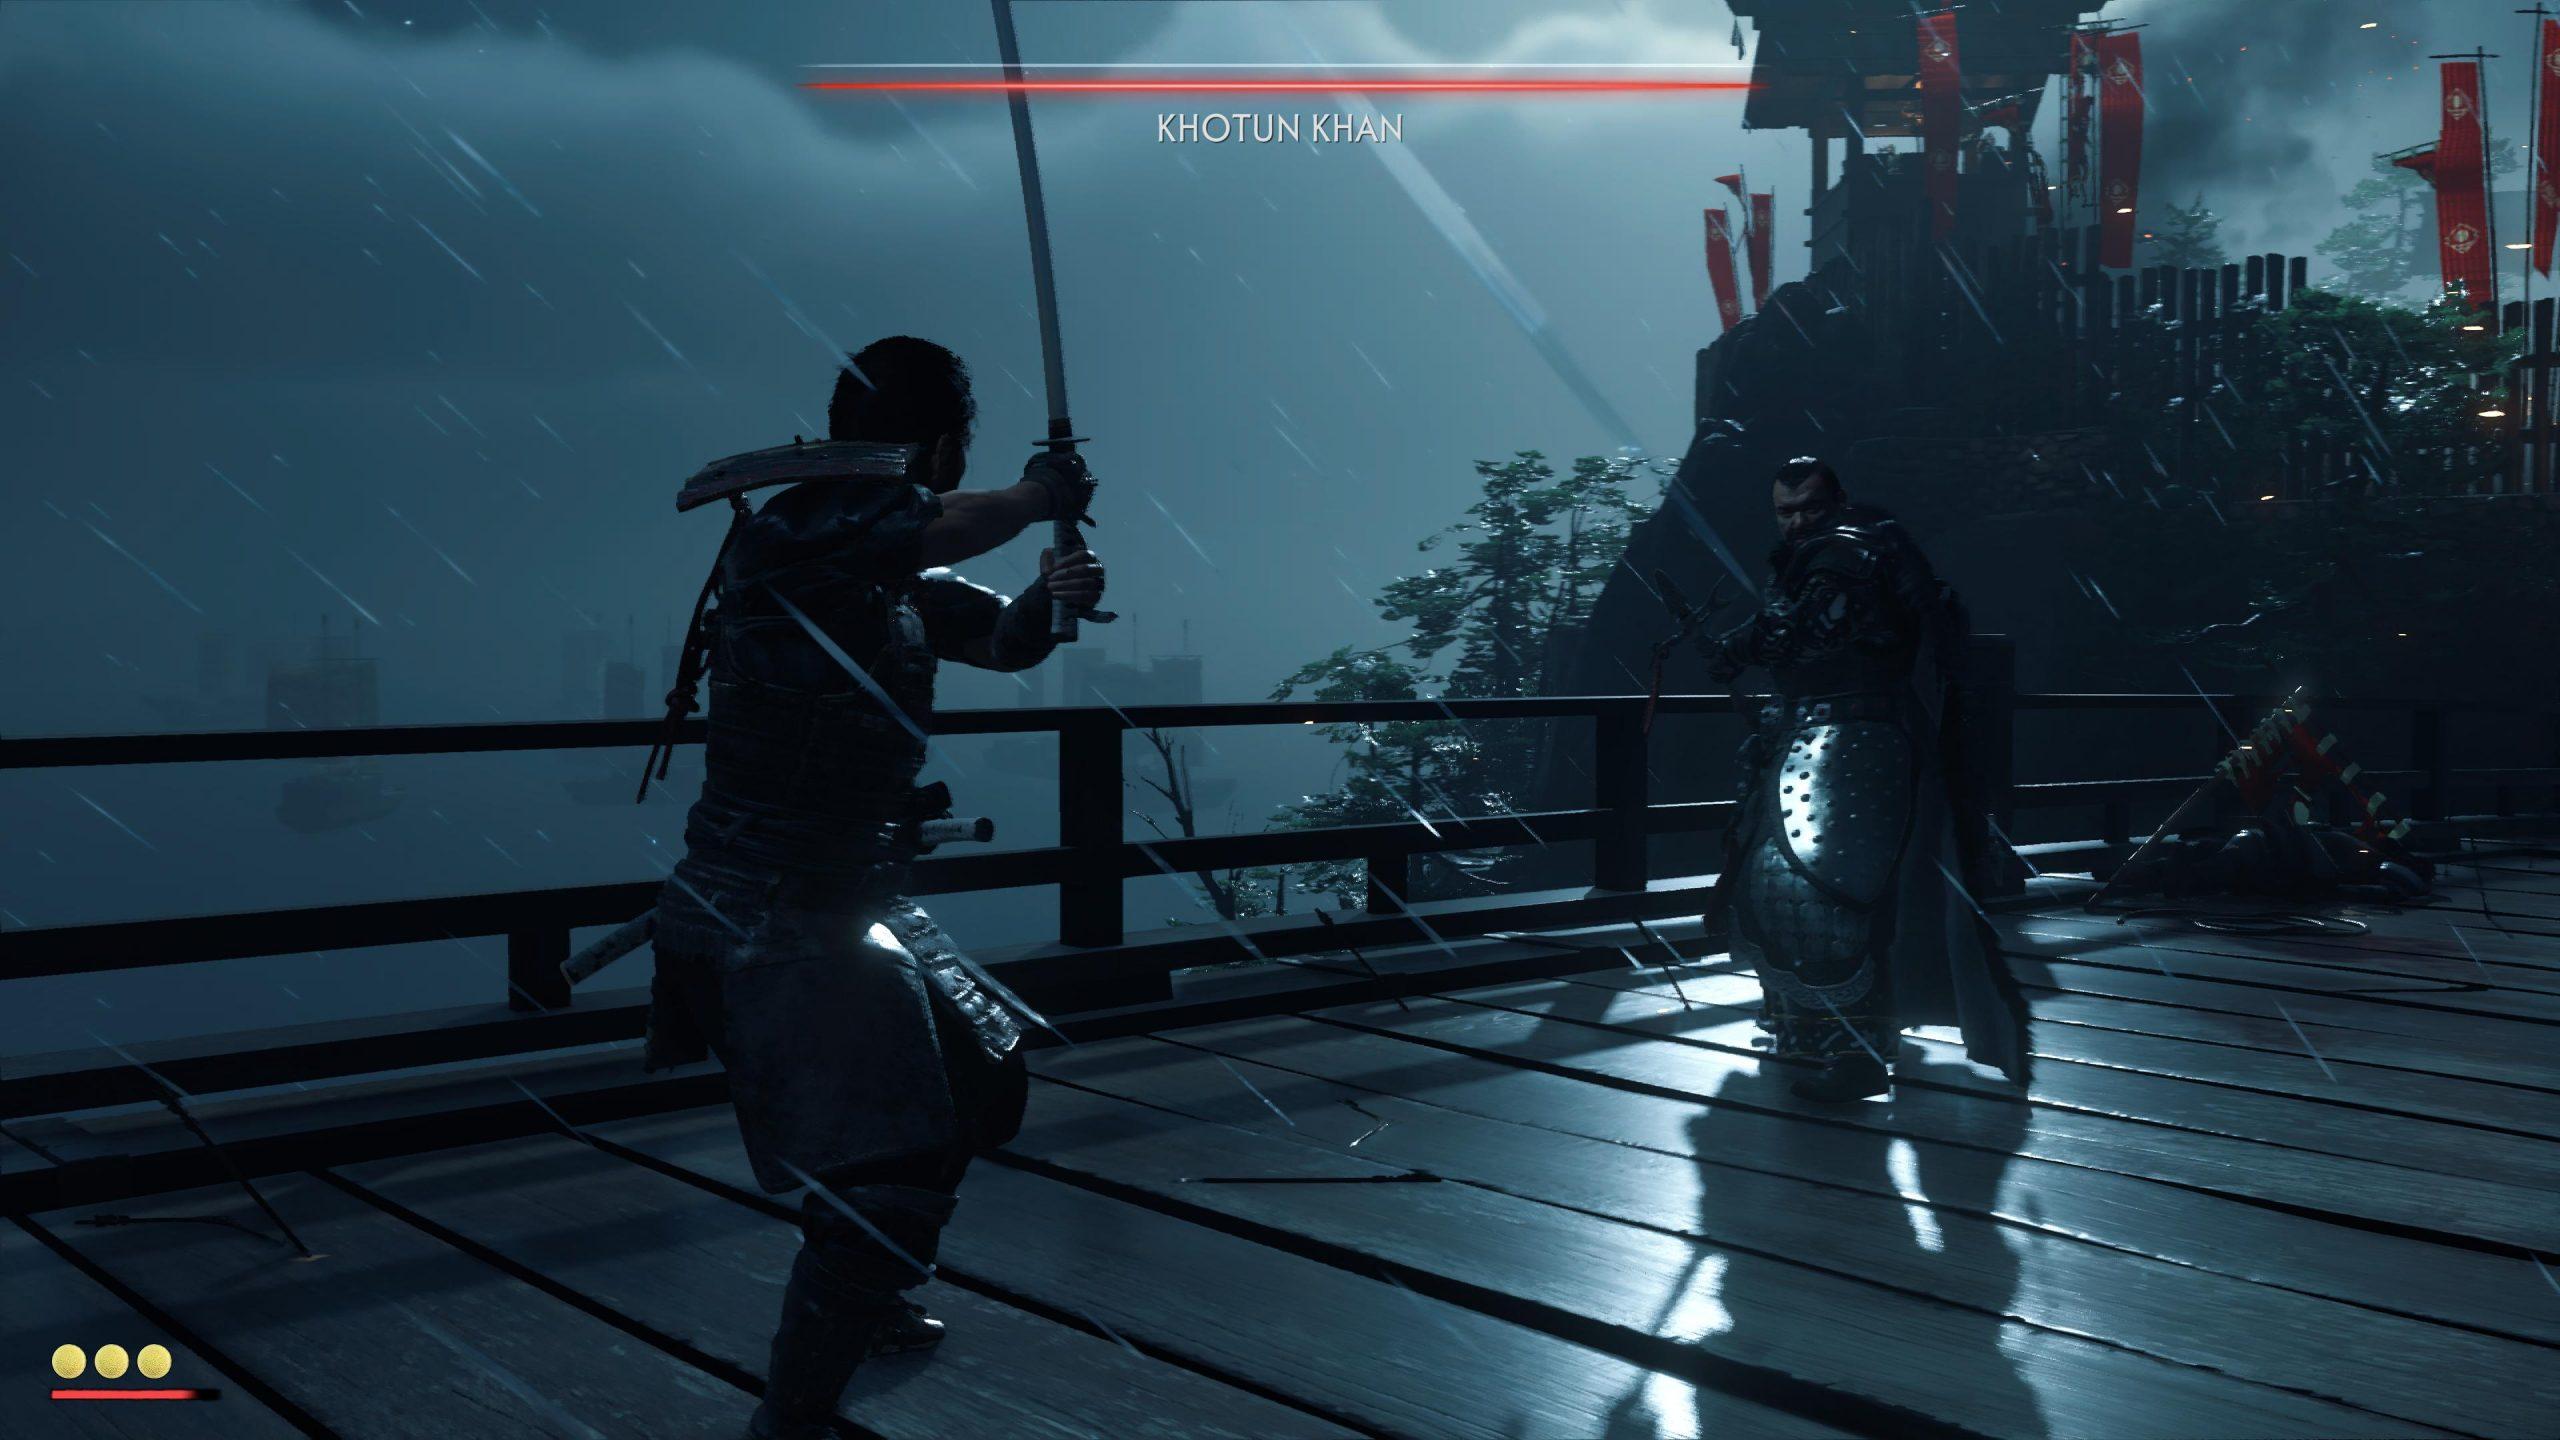 test ghost of tsushima ps5 visuel 4 gameplay combat